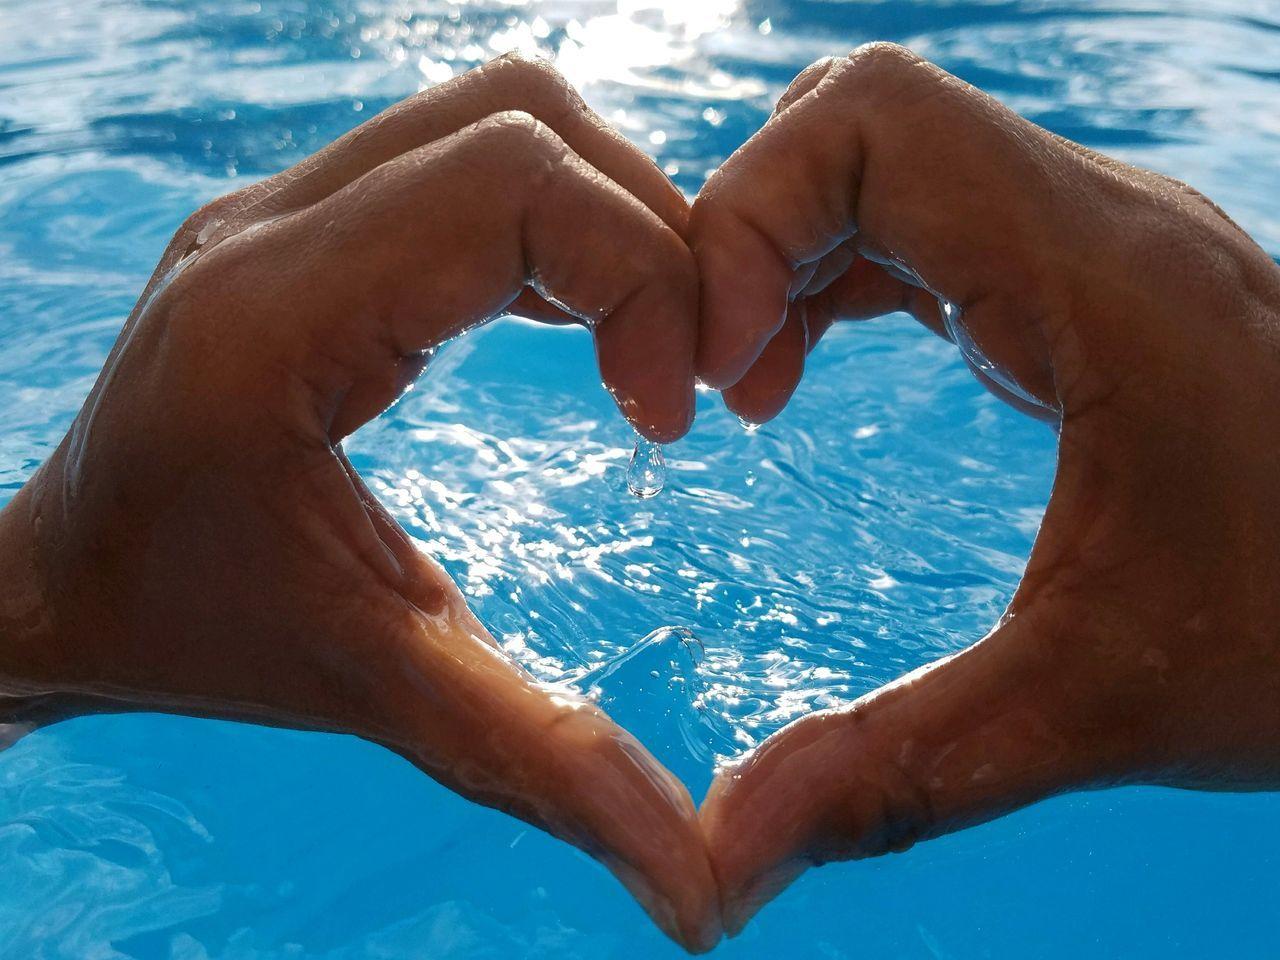 Love, what's that?Human Body Part Swimming Pool Water Human Hand EyeEm EyeEm Best Shots Bokeh Getting Inspired BlueEyeEm Selects Sommergefühle